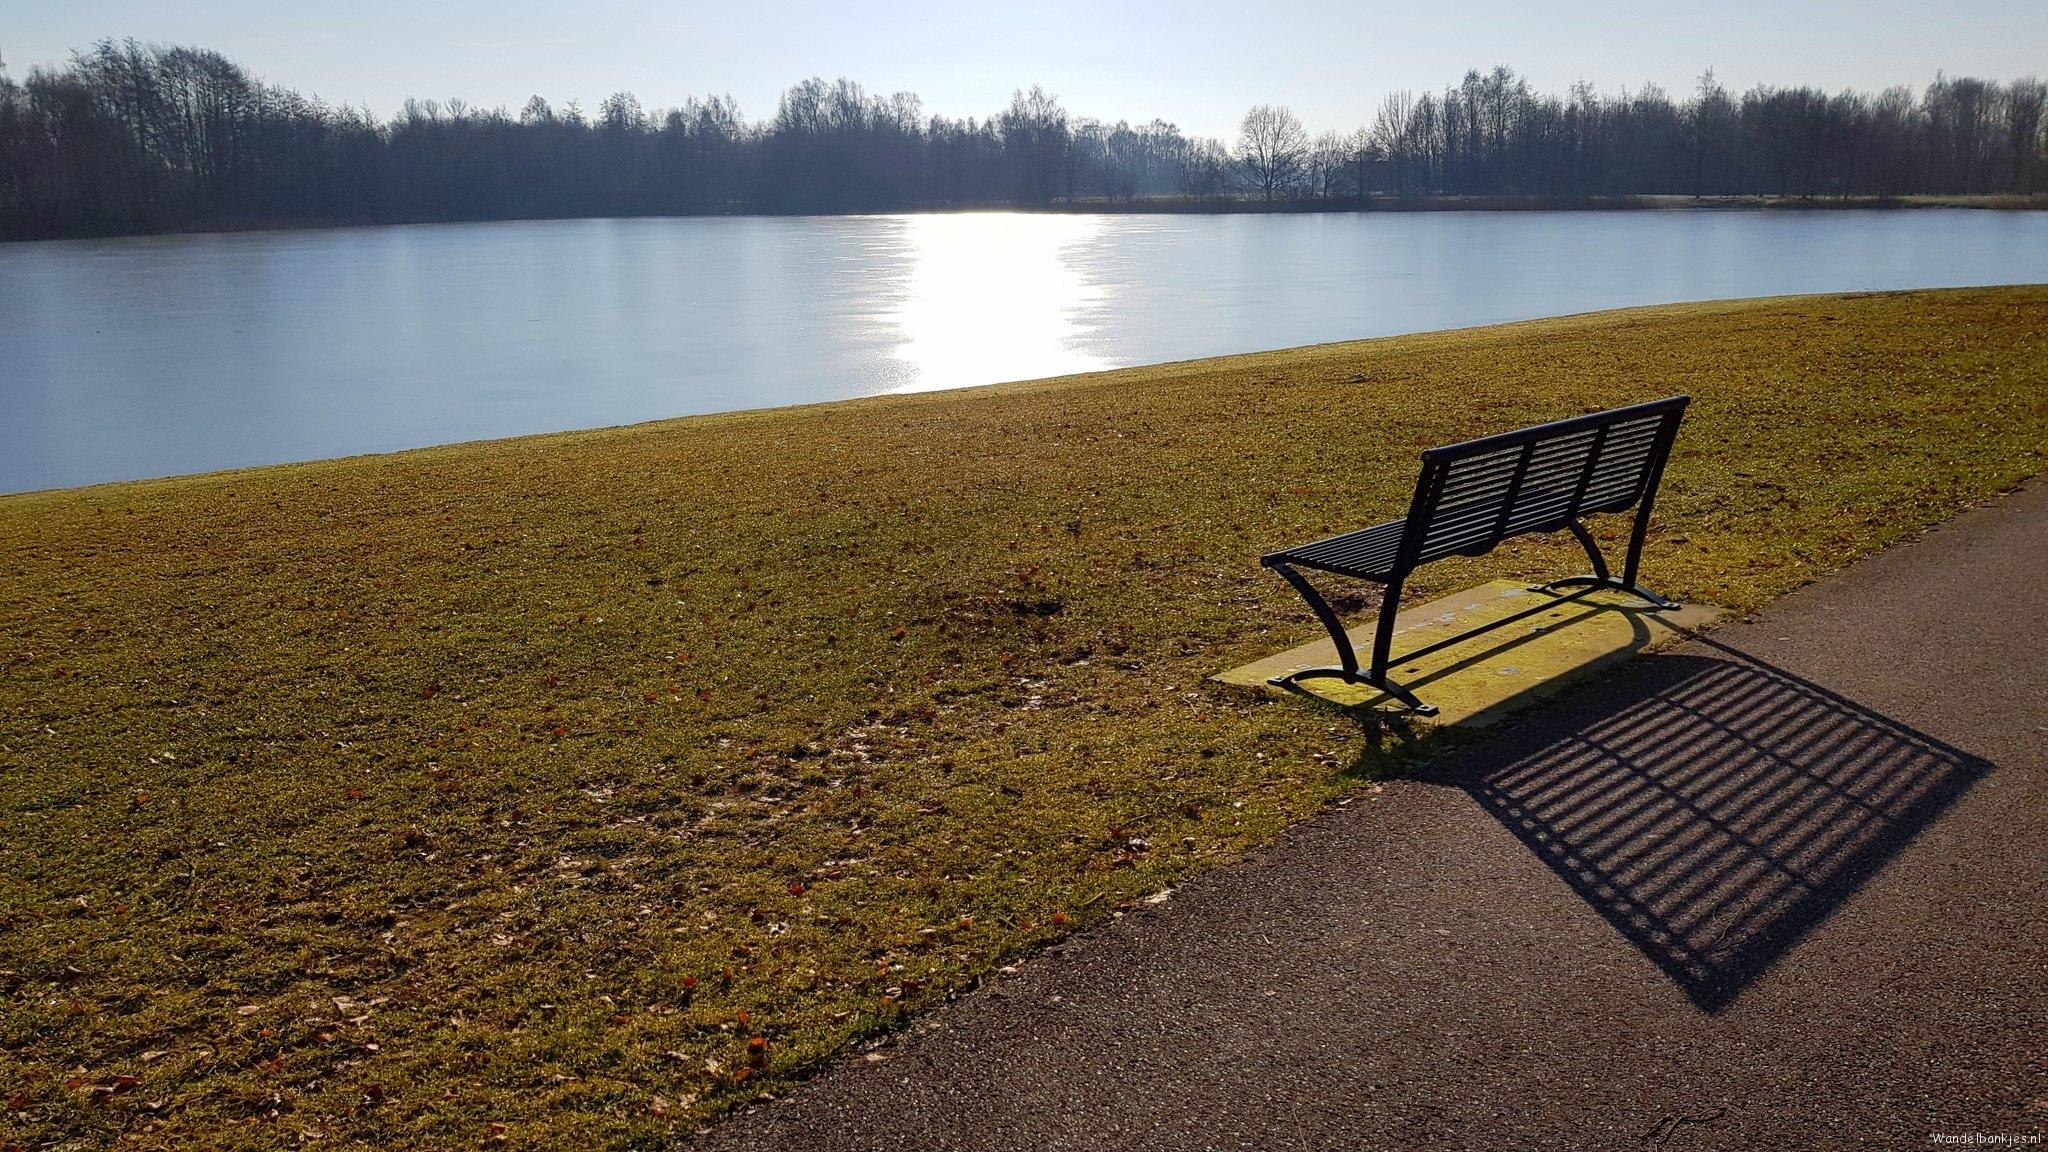 rt-hansterheijne-walking-benches-walkersbenches-myfavebench-rutbeek-enschede-twente-the-netherlands-netherlands-https-t-co-wrzek1yklc